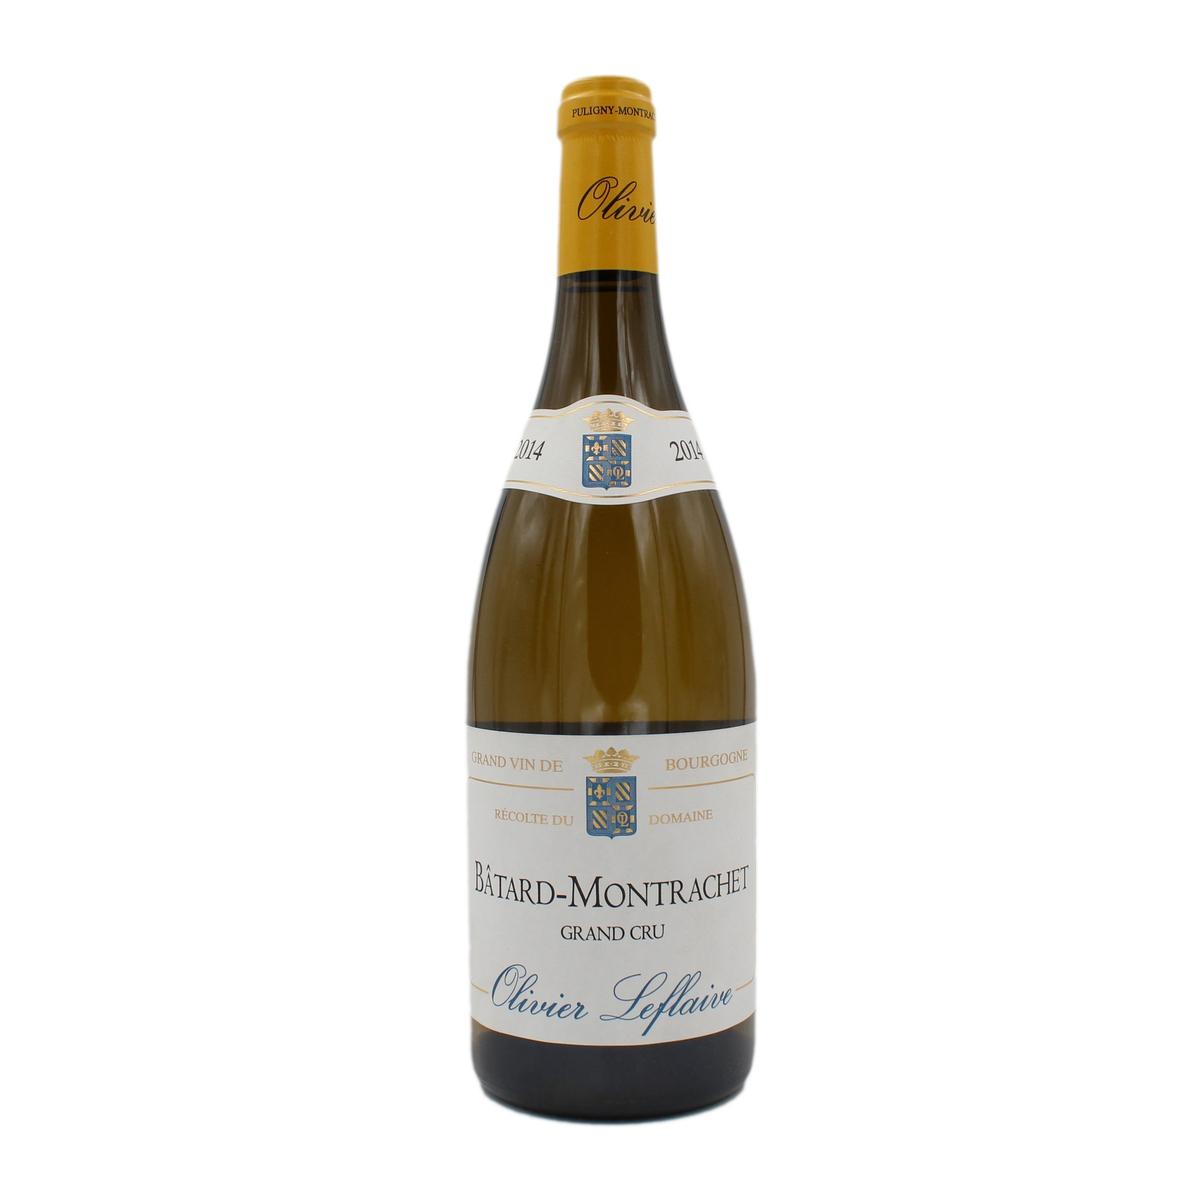 Bâtard-Montrachet Grand Cru Domaine 2014 Domaine Olivier Leflaive